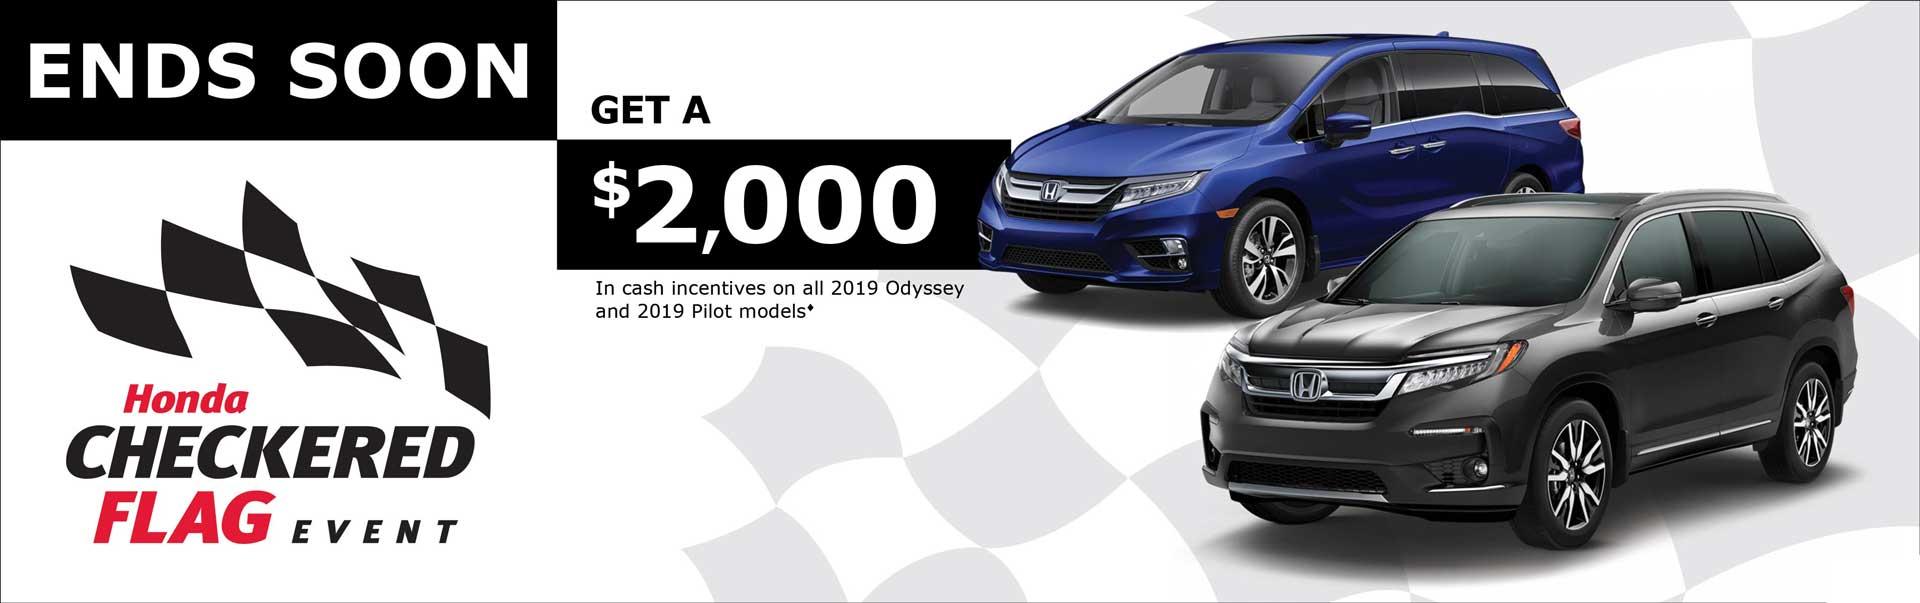 Save on Odyssey at Kanata Honda